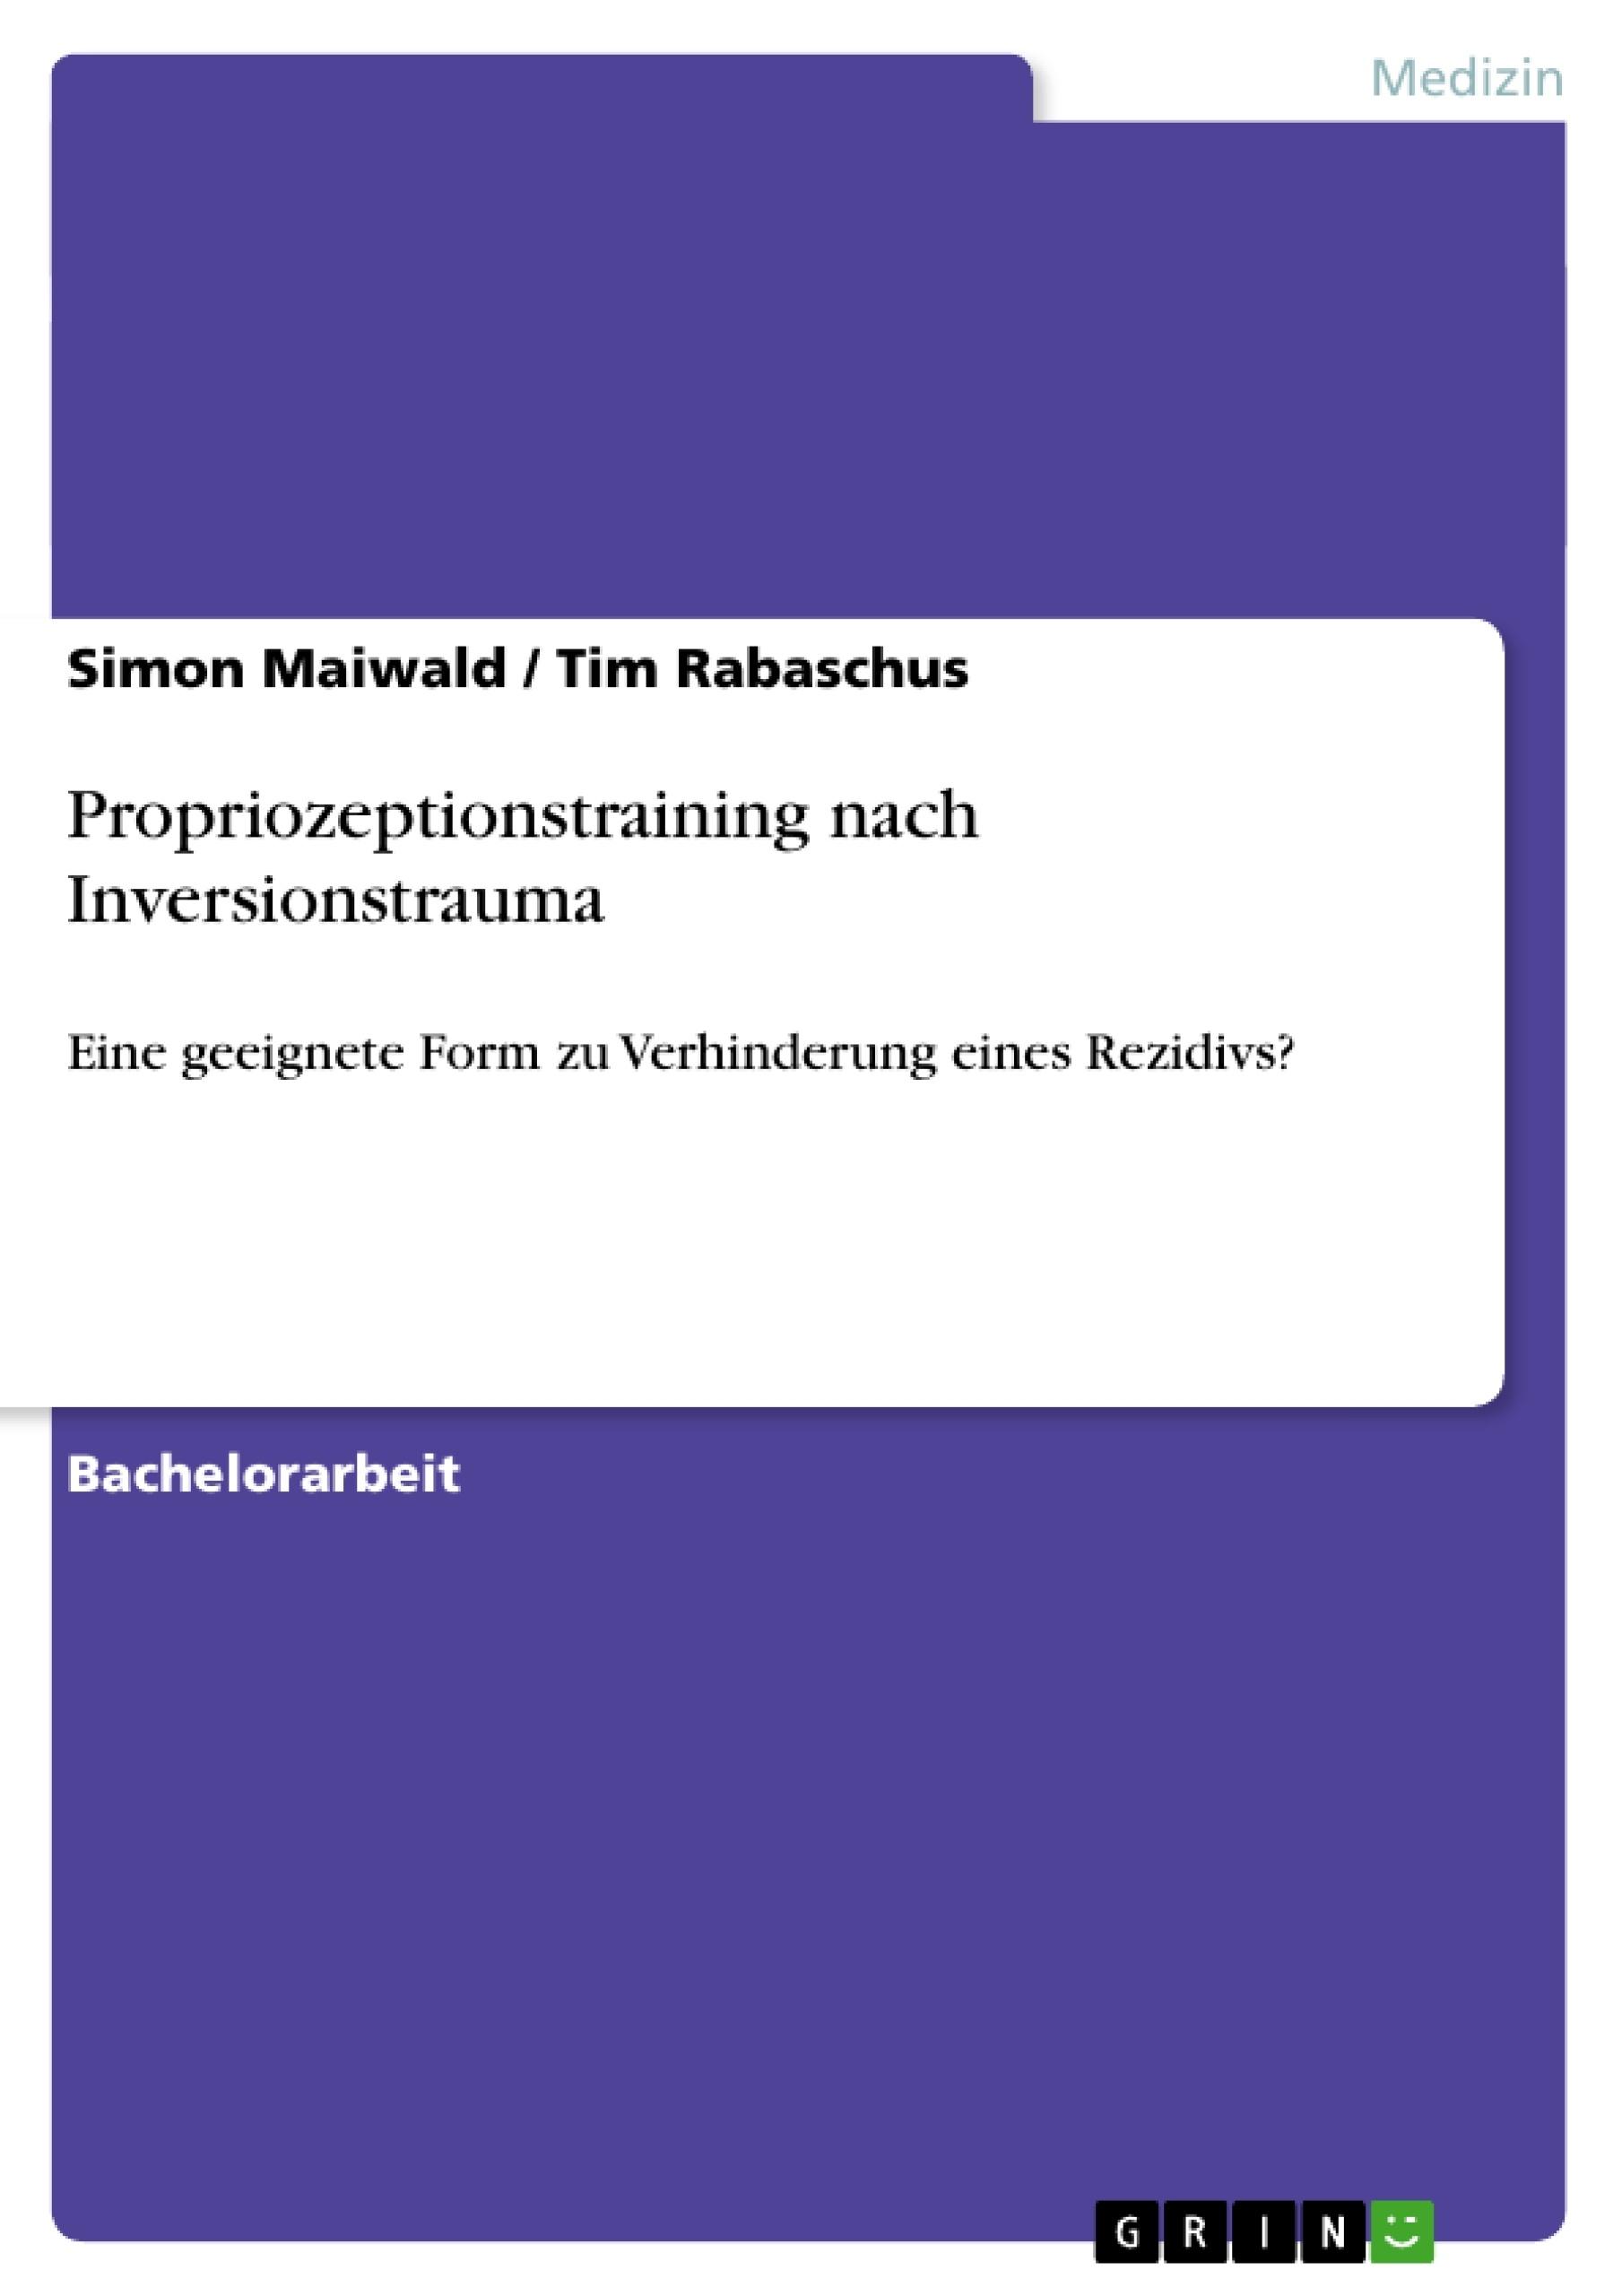 Titel: Propriozeptionstraining nach Inversionstrauma